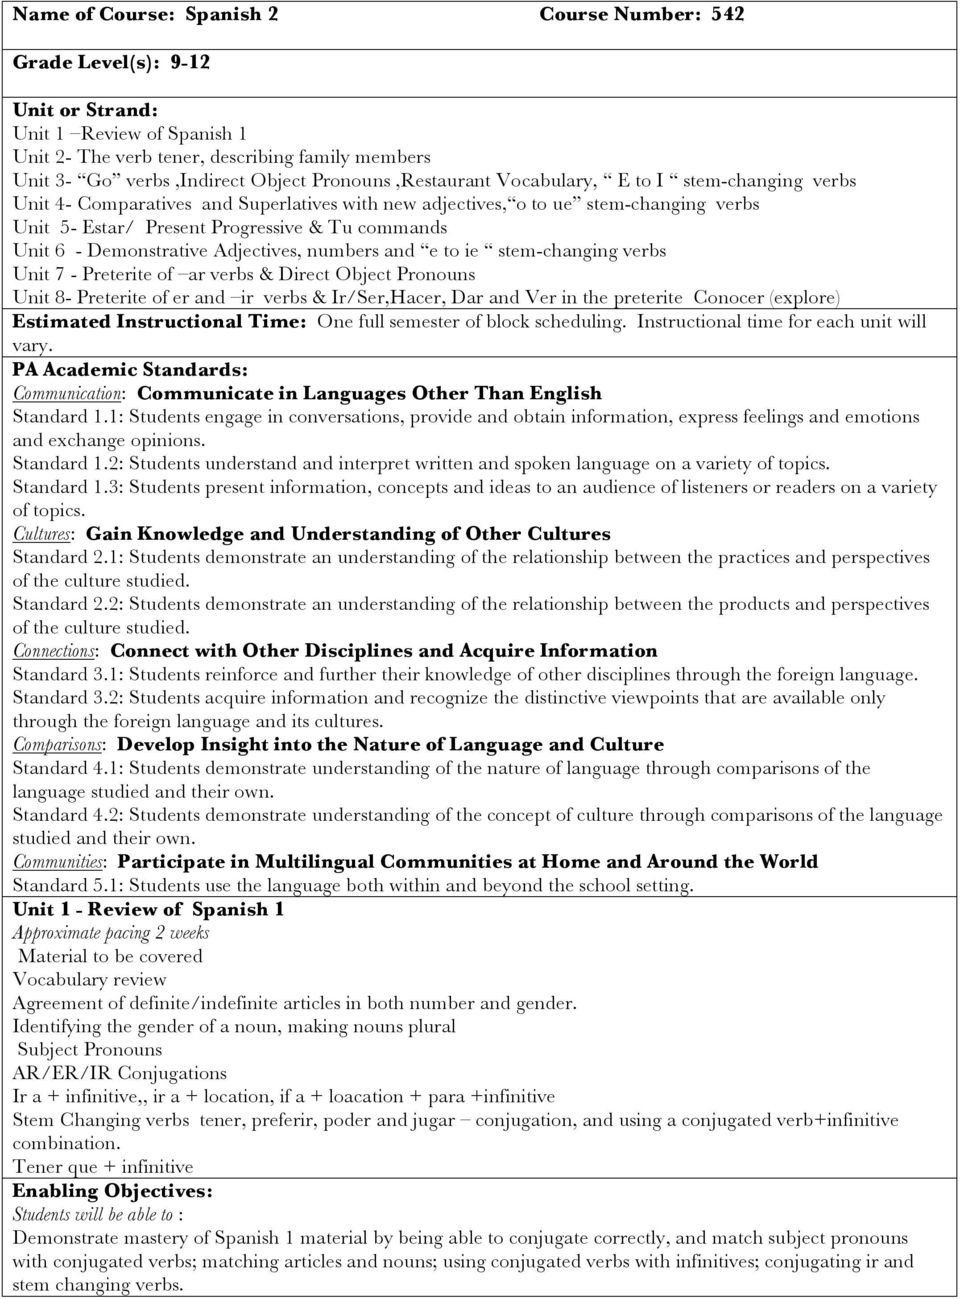 Pin On Printable Worksheet Templates For Teachers